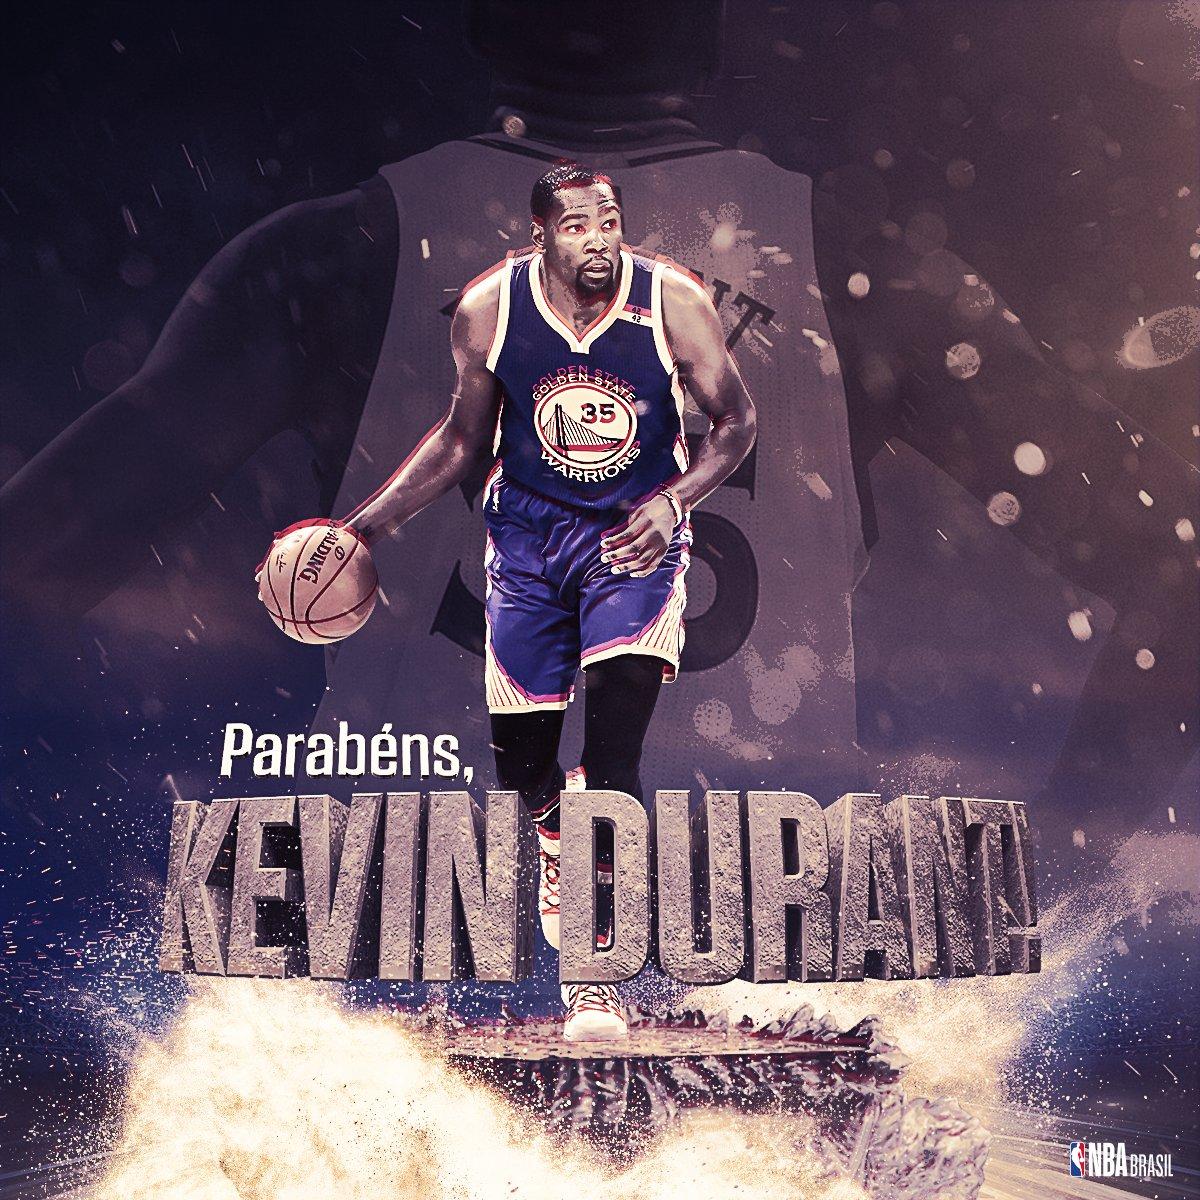 O #MVP das #NBAFinals completa 29 anos! Feliz aniversário, @KDTrey5! #NBABDay